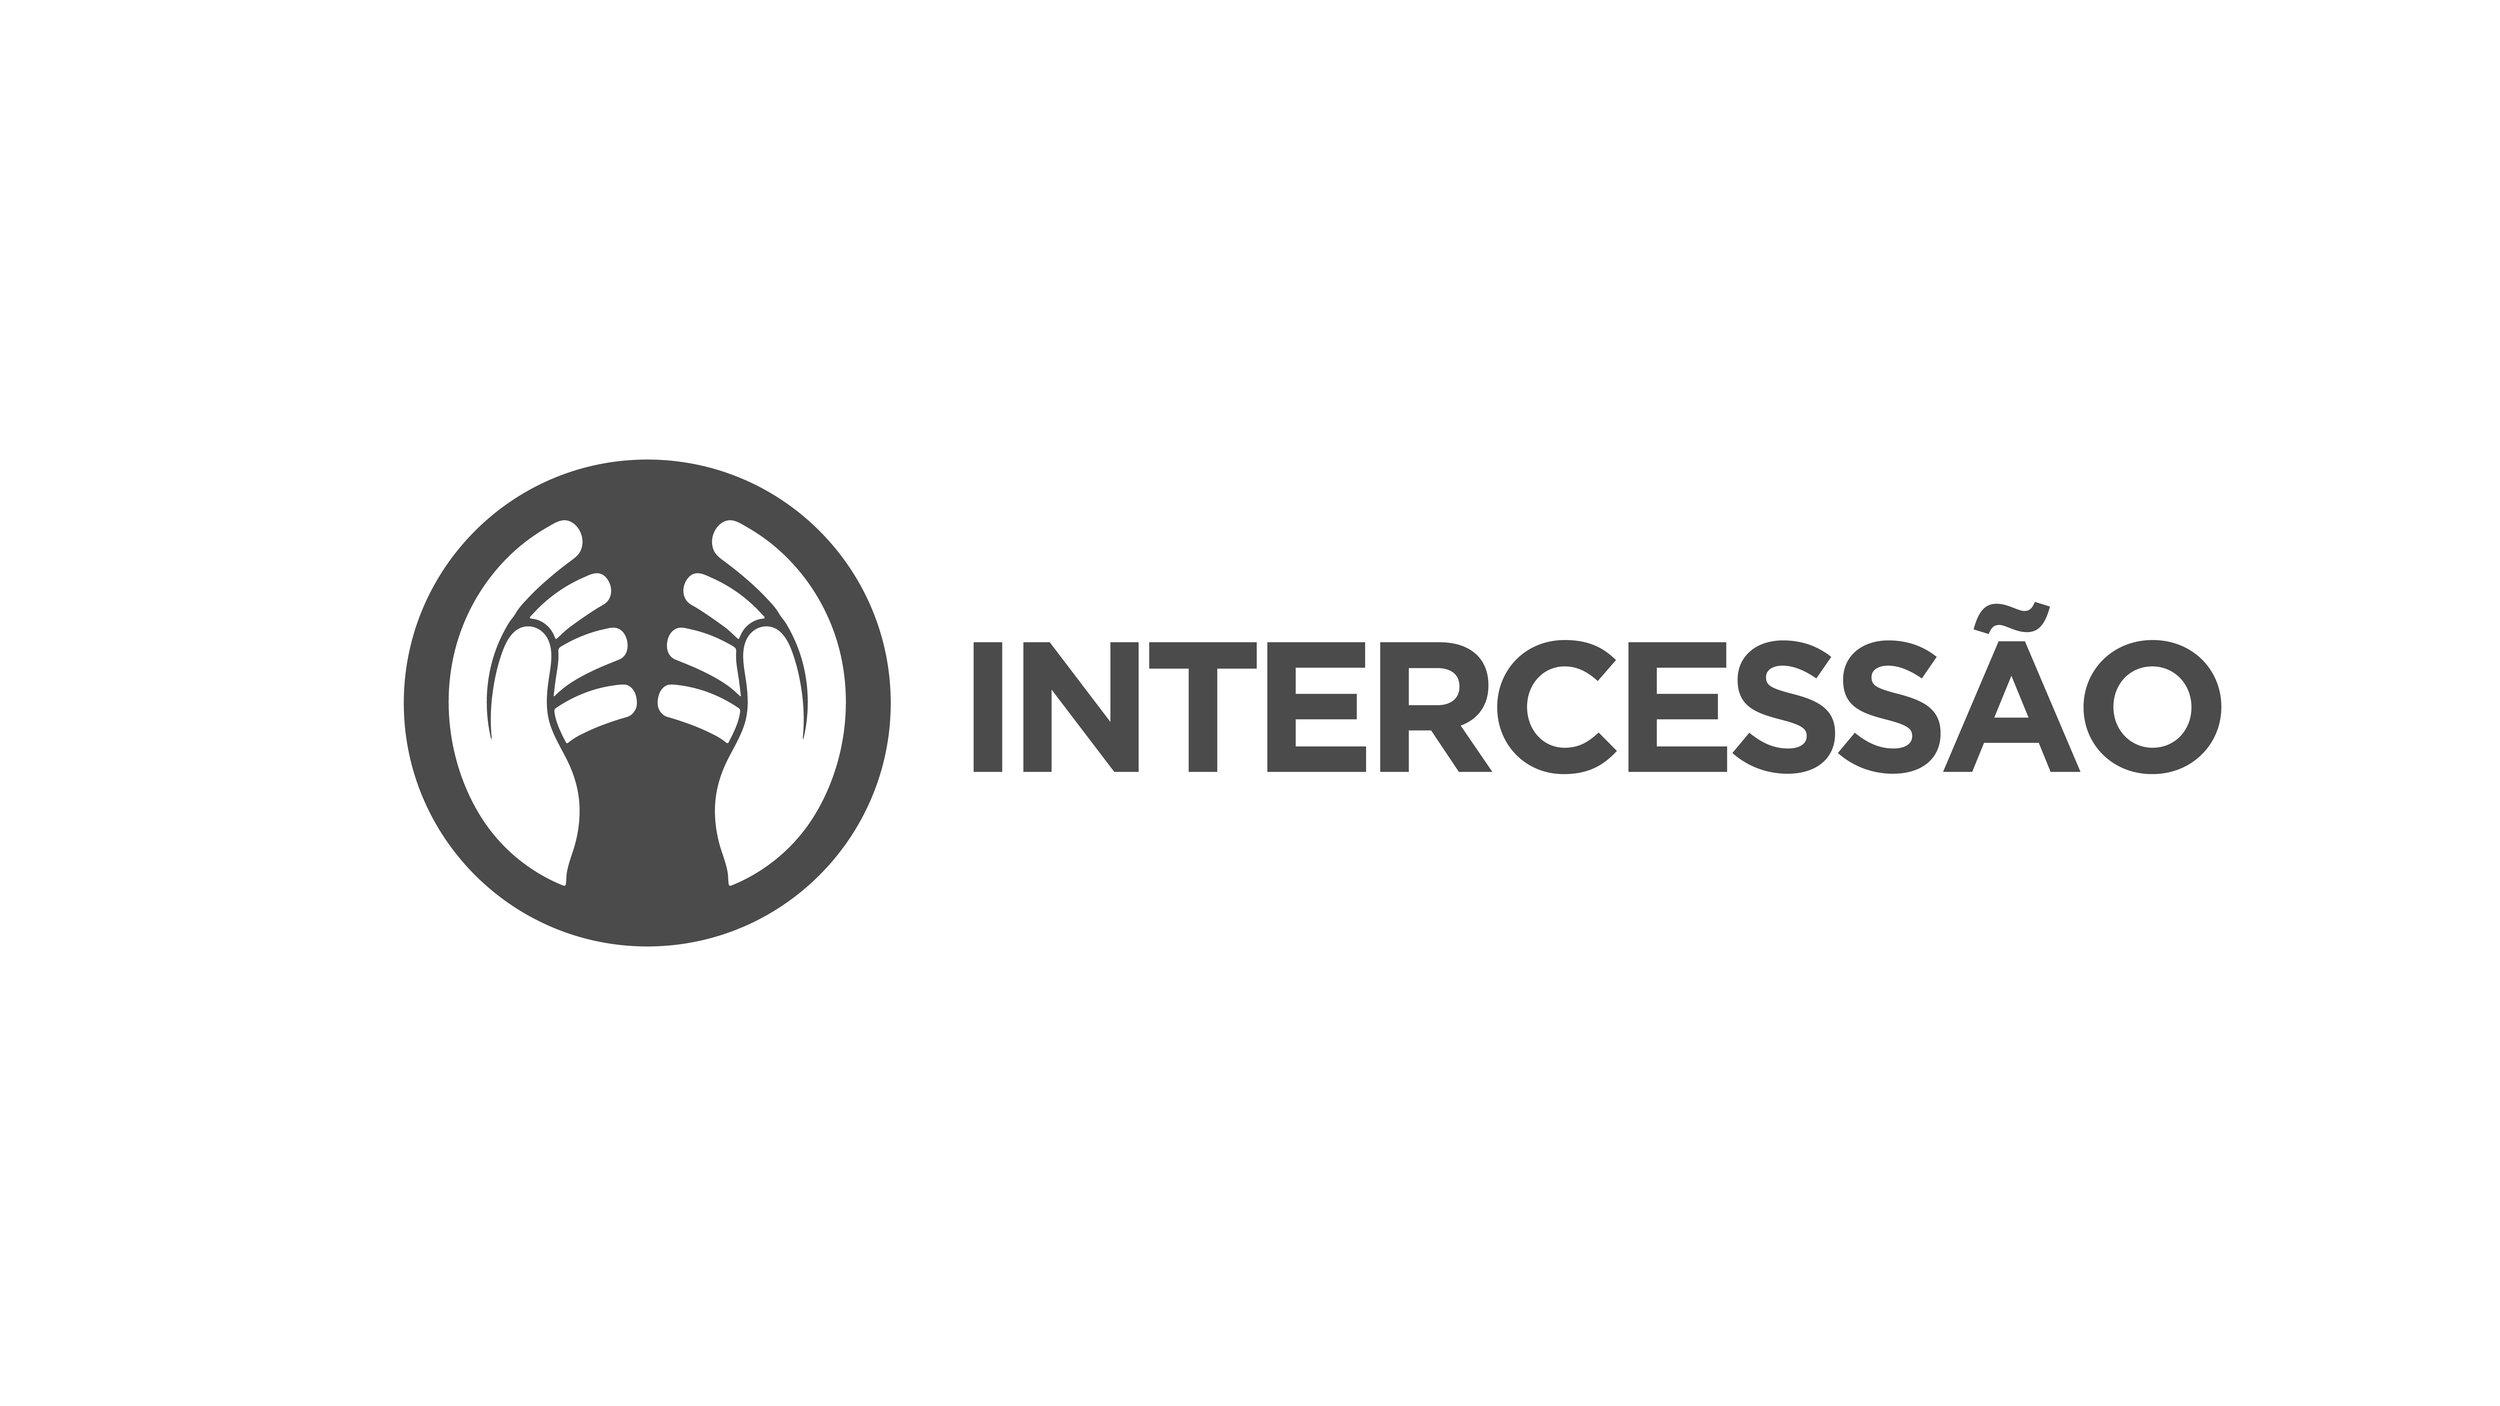 Intercessao_Marca-03.jpg